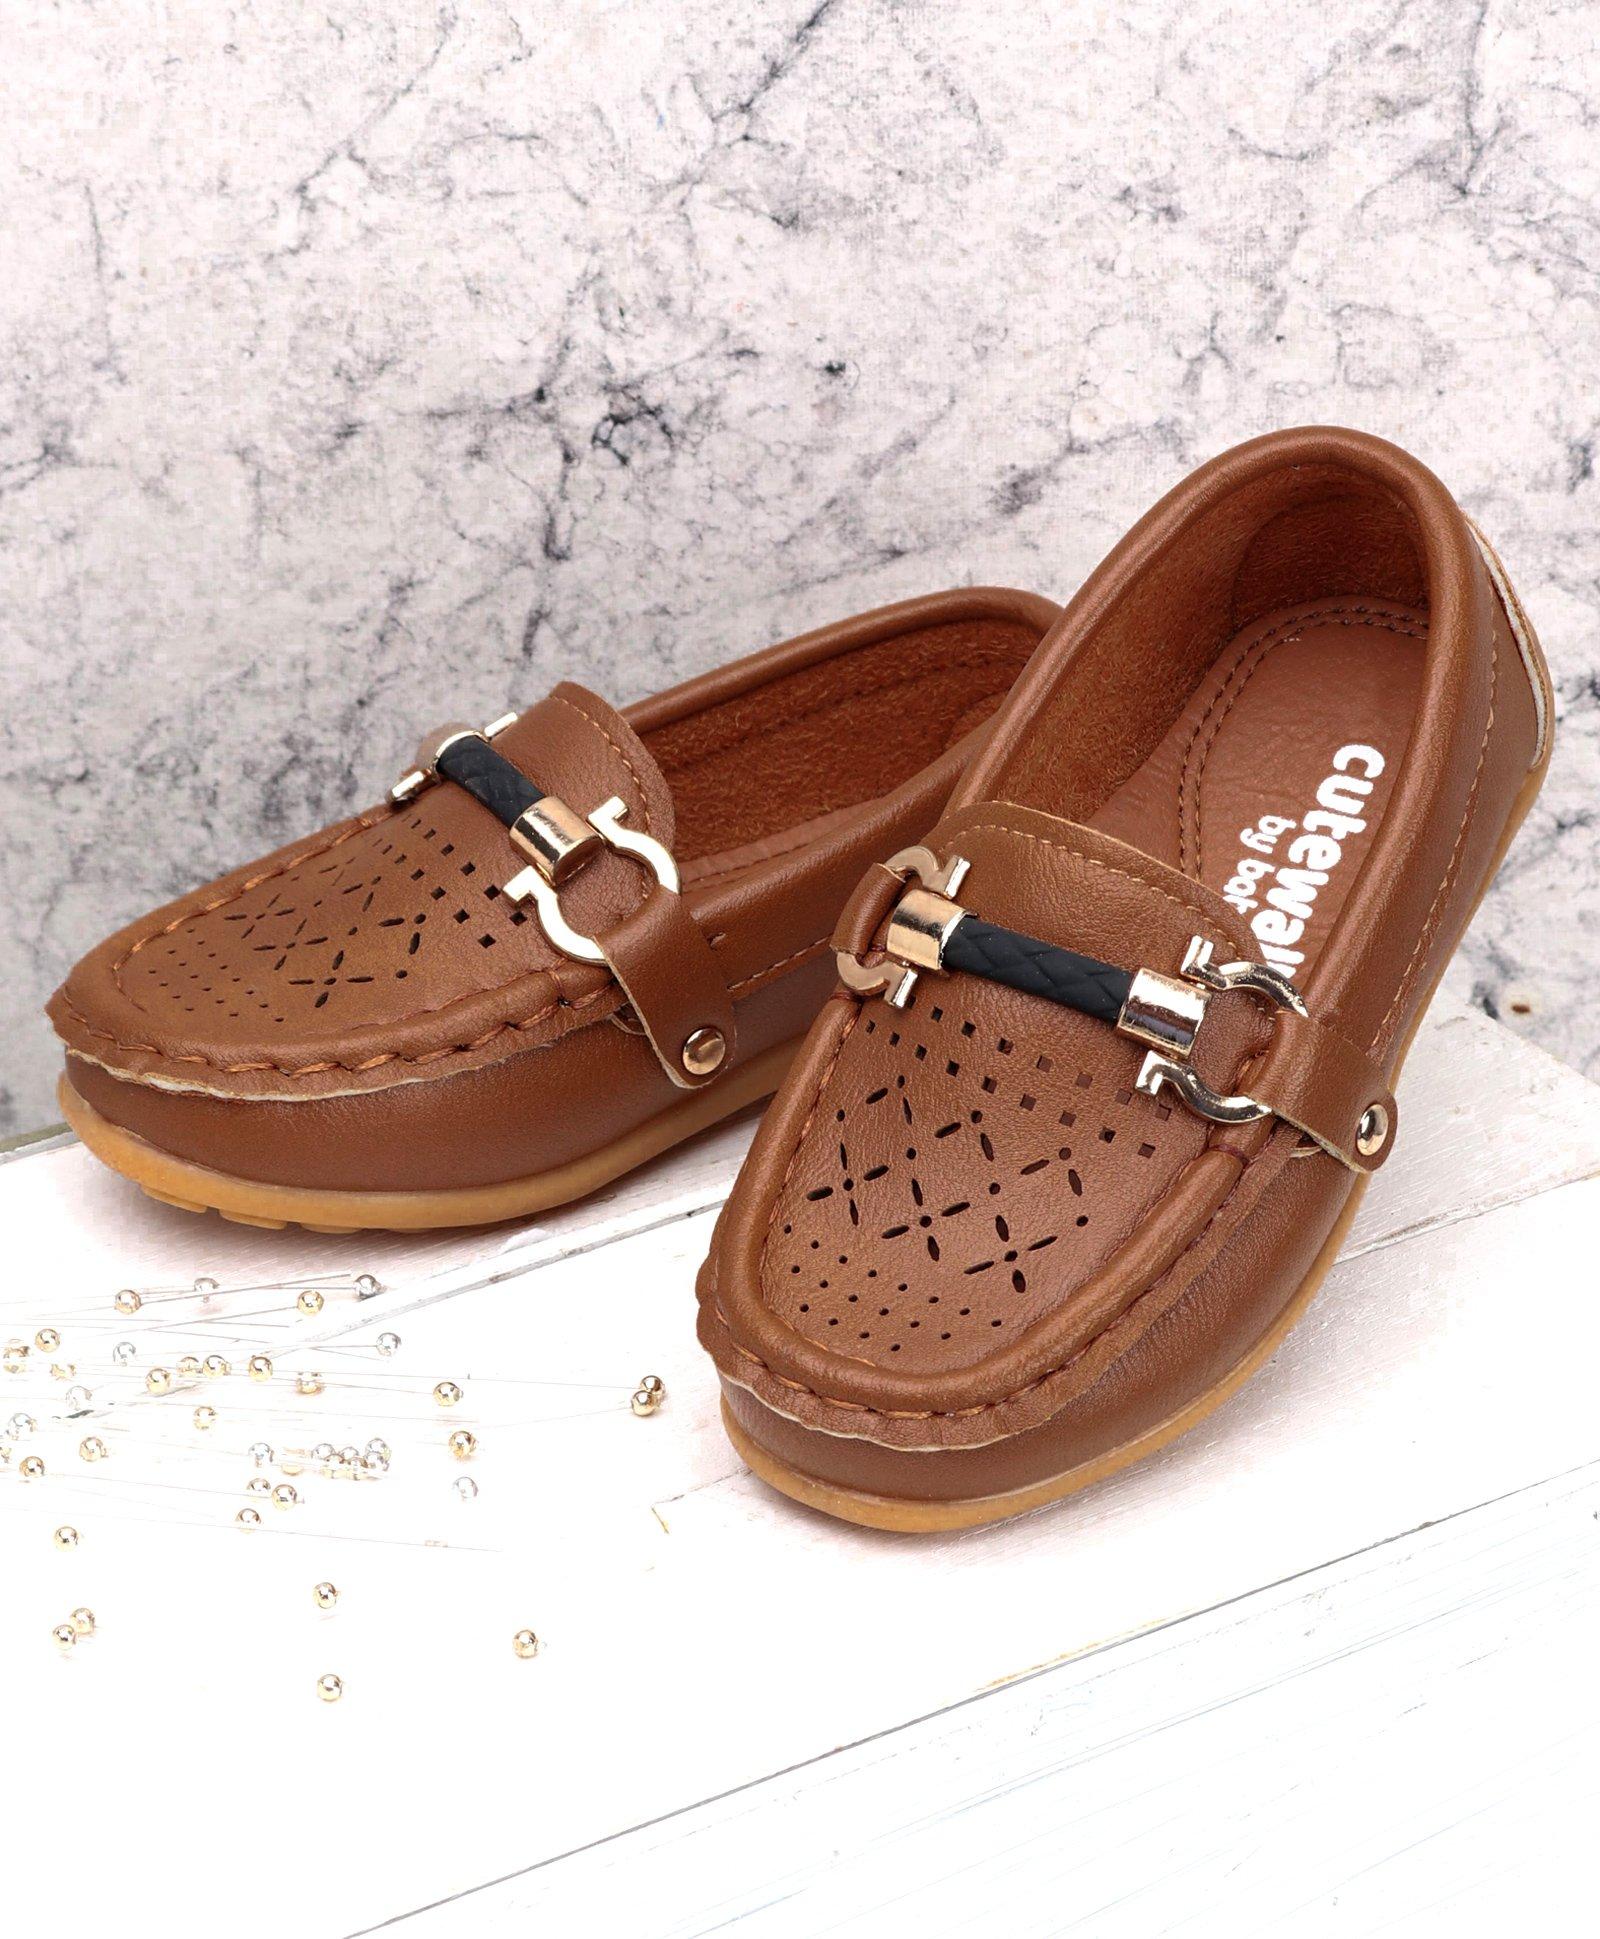 d1cb13d9722d Buy Cute Walk by Babyhug Designer Loafer Shoes Brown for Boys (2 ...